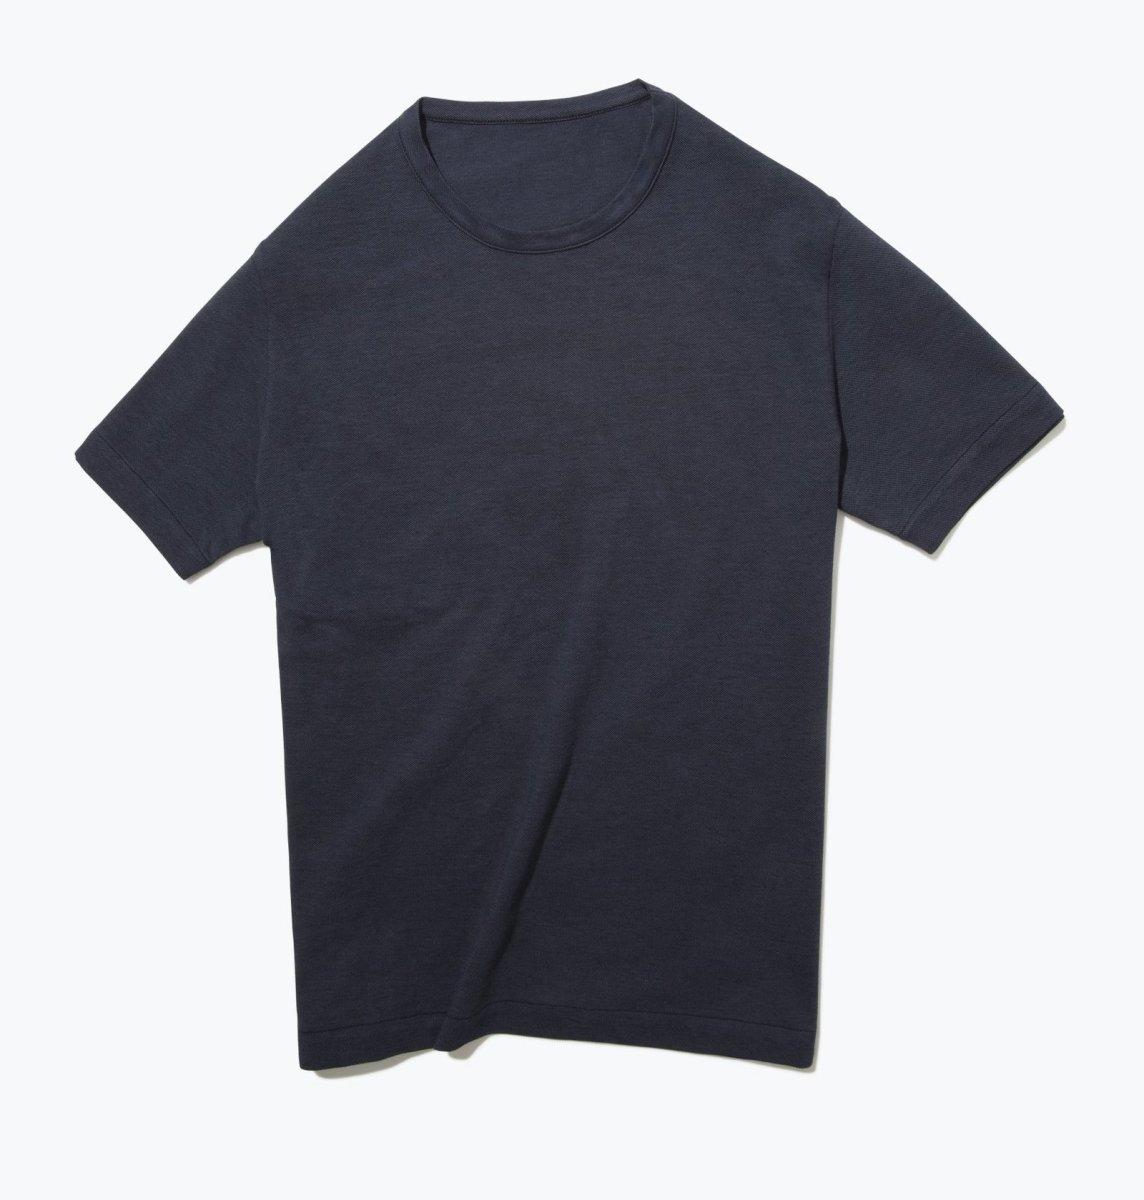 tshirt_navy_1_2800x